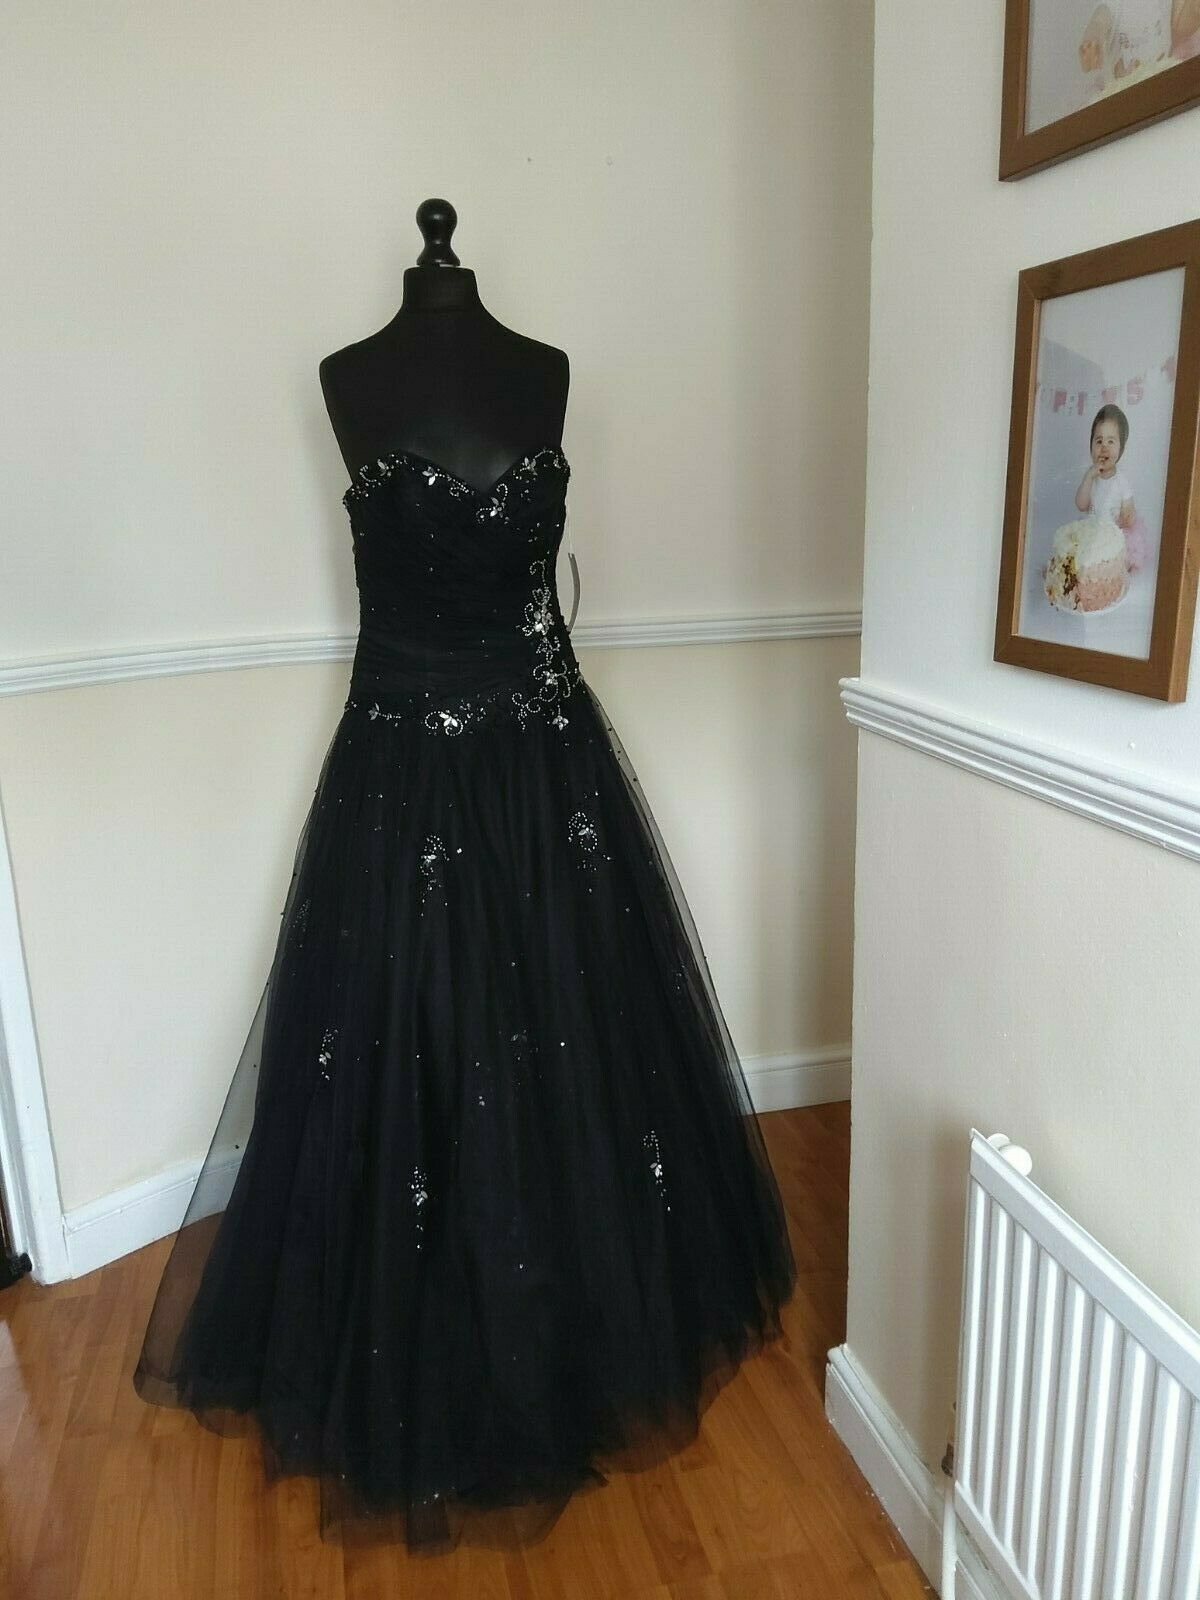 LADIES BLACK SEQUIN/BEAD SIZE 14 DRESS BY ROSETTA NICOLINI BRIDESMAID/PROM/BALL